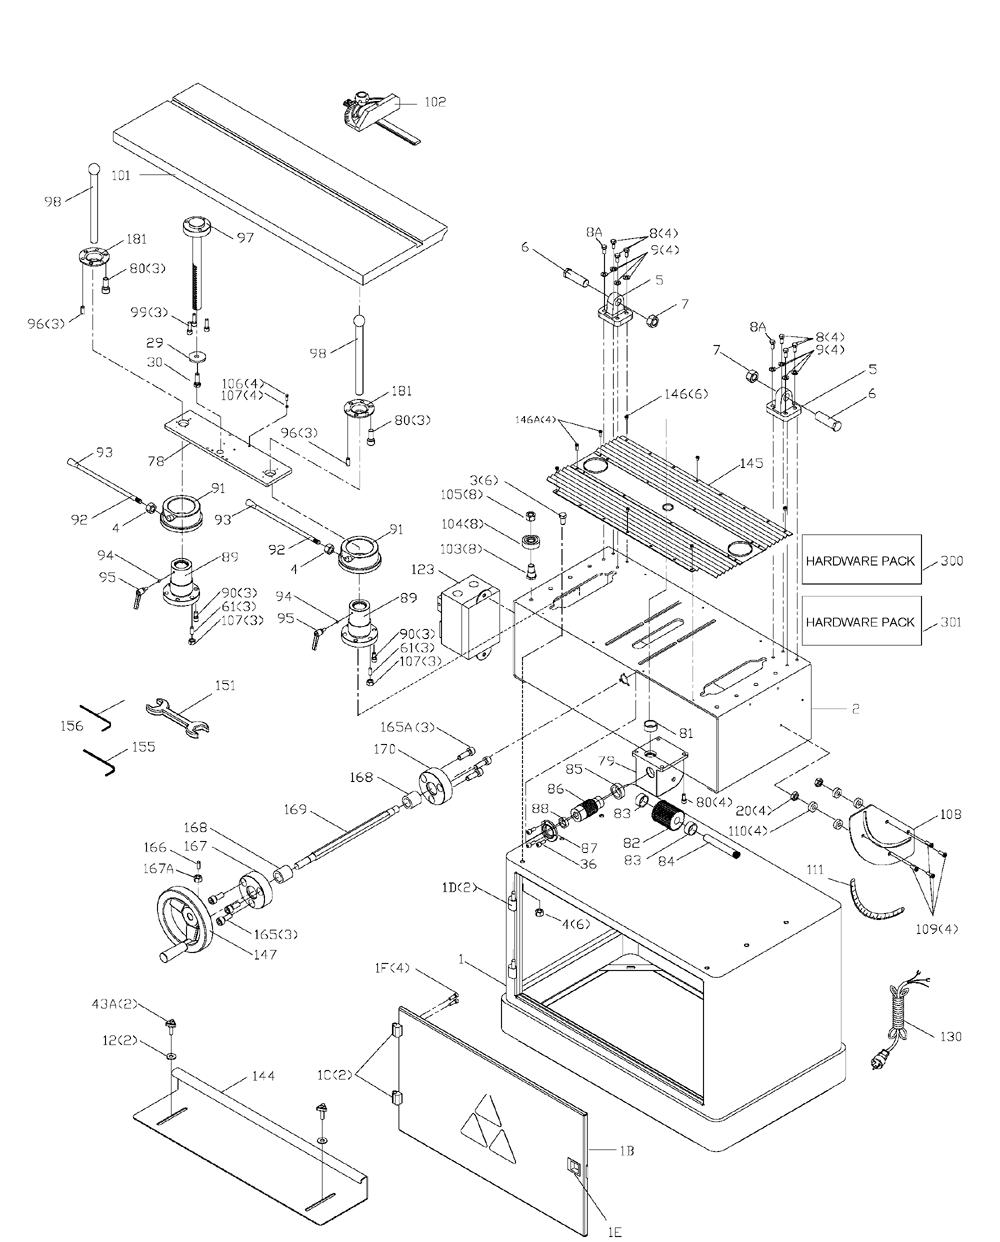 Buy Delta 31-396 Type-1 6 Inch 3 Horsepower Oscillating